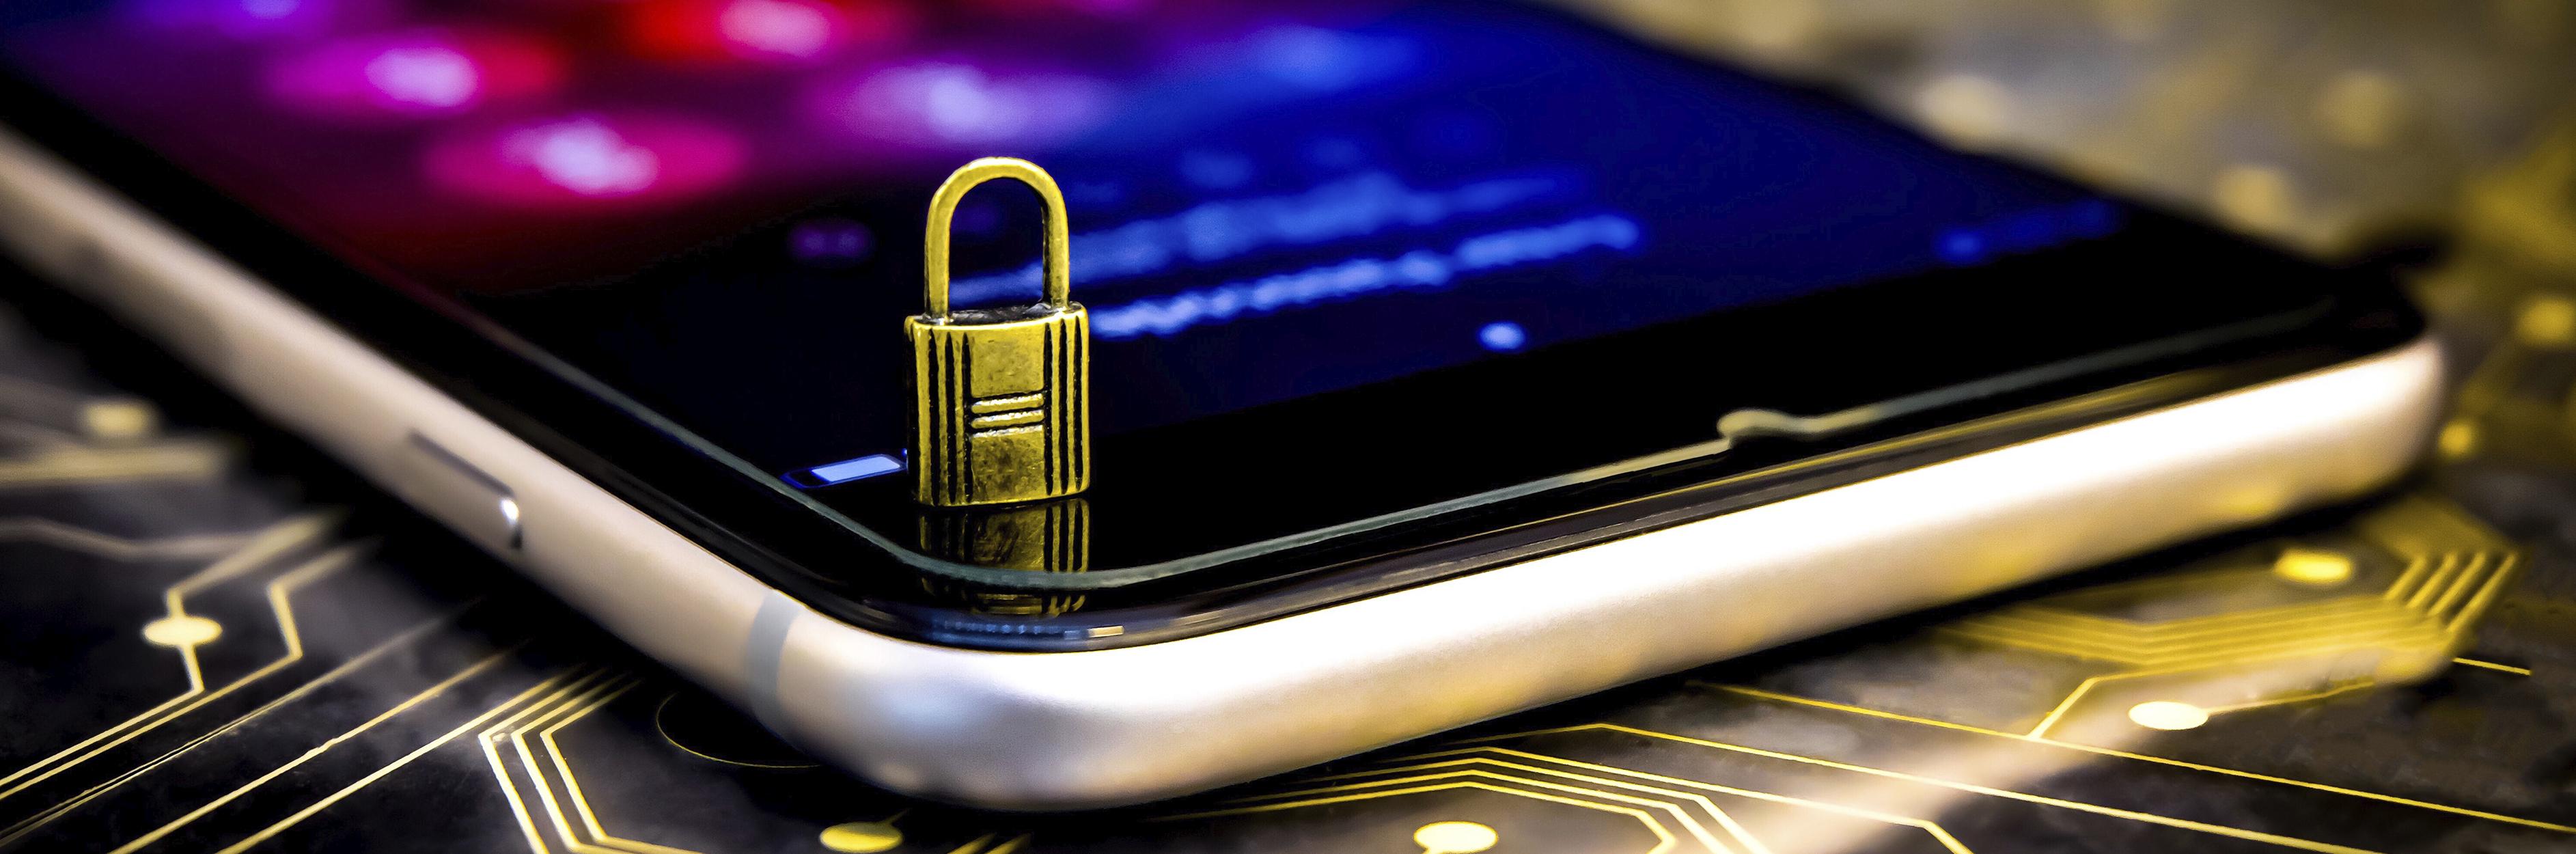 Secret Lleida.net, the definite tool to protect your trade secrets